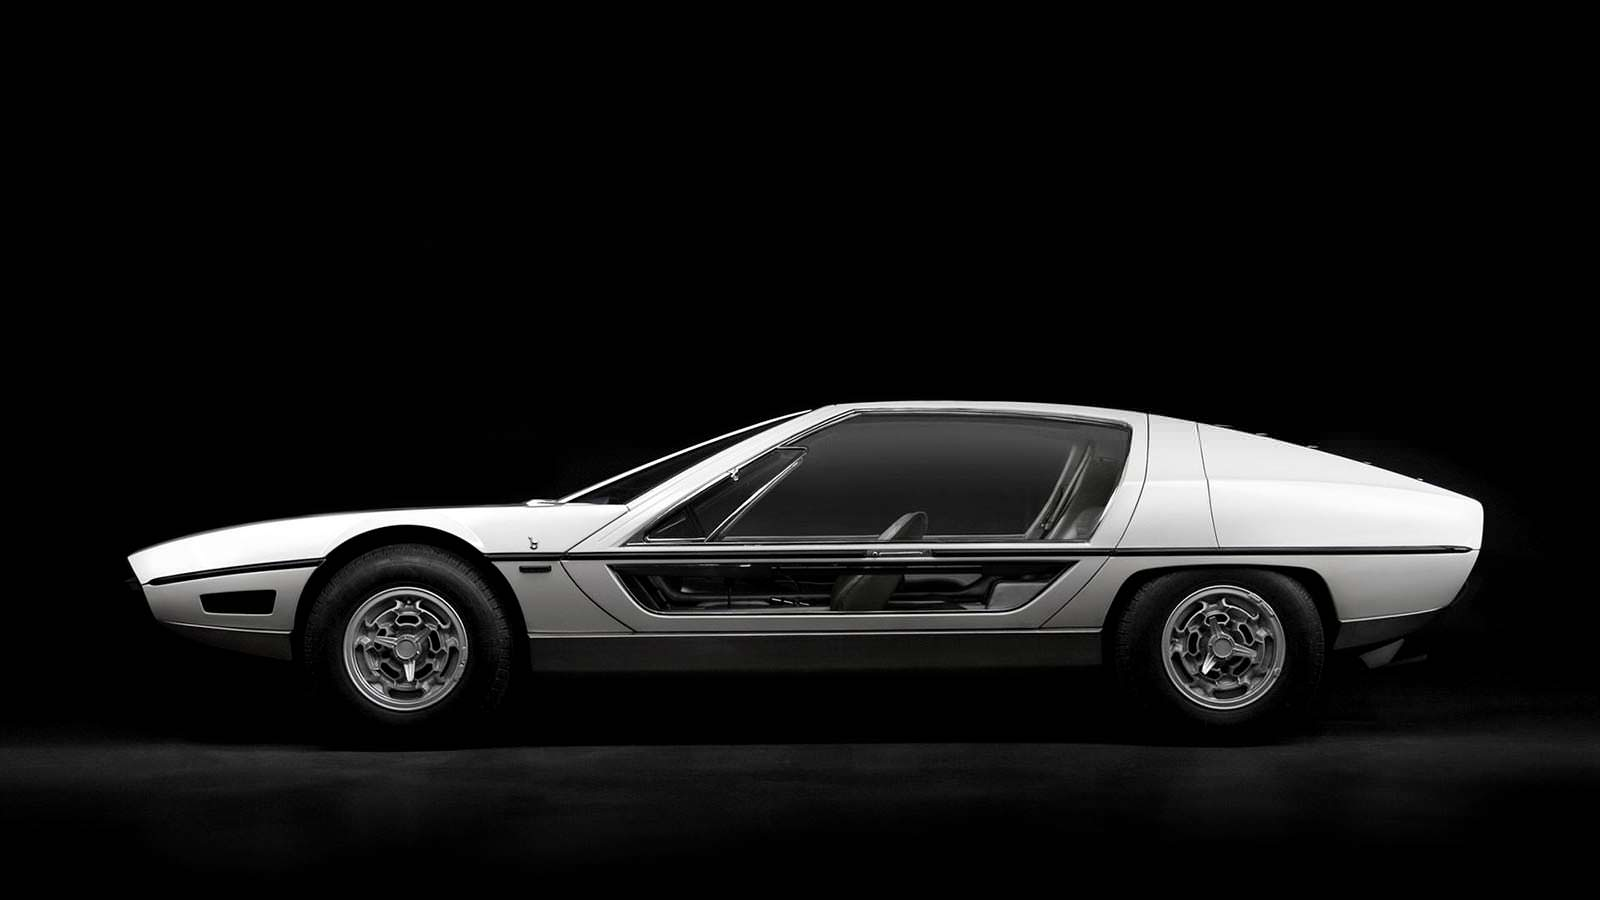 Lamborghini TP200 Marzal. Стеклянные двери крылья чайки